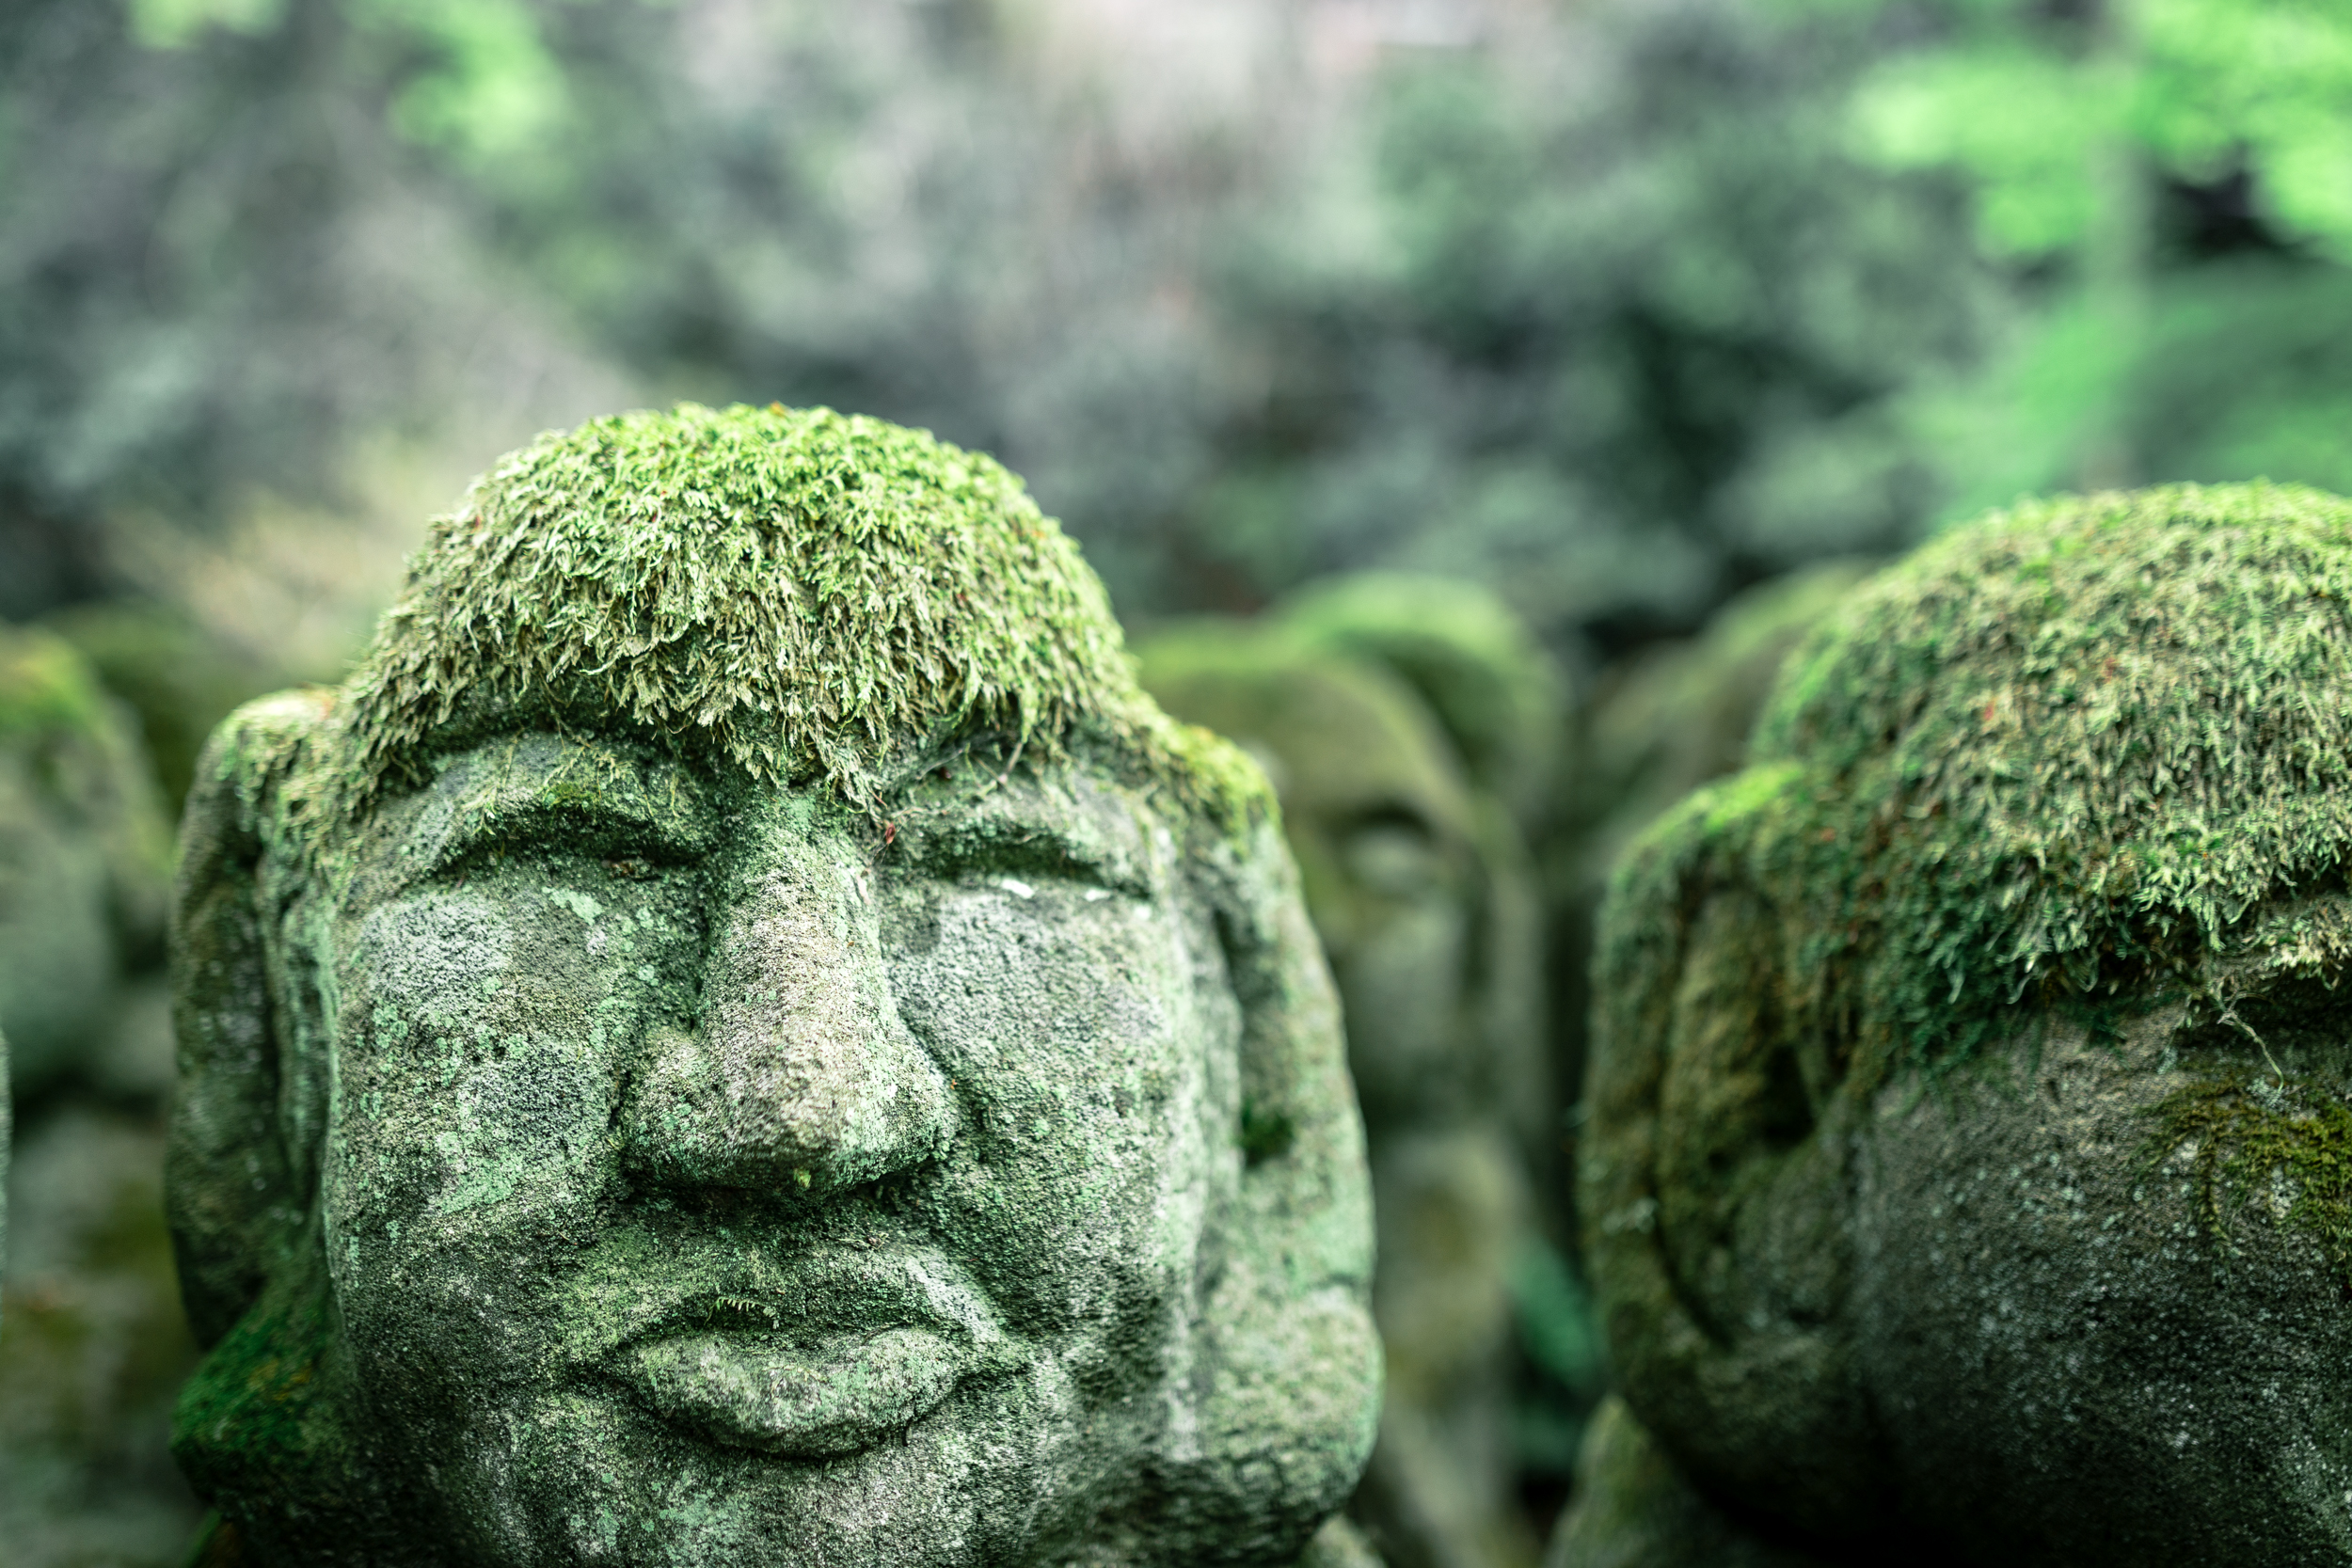 A solemn face of a moss-covered  rakan.